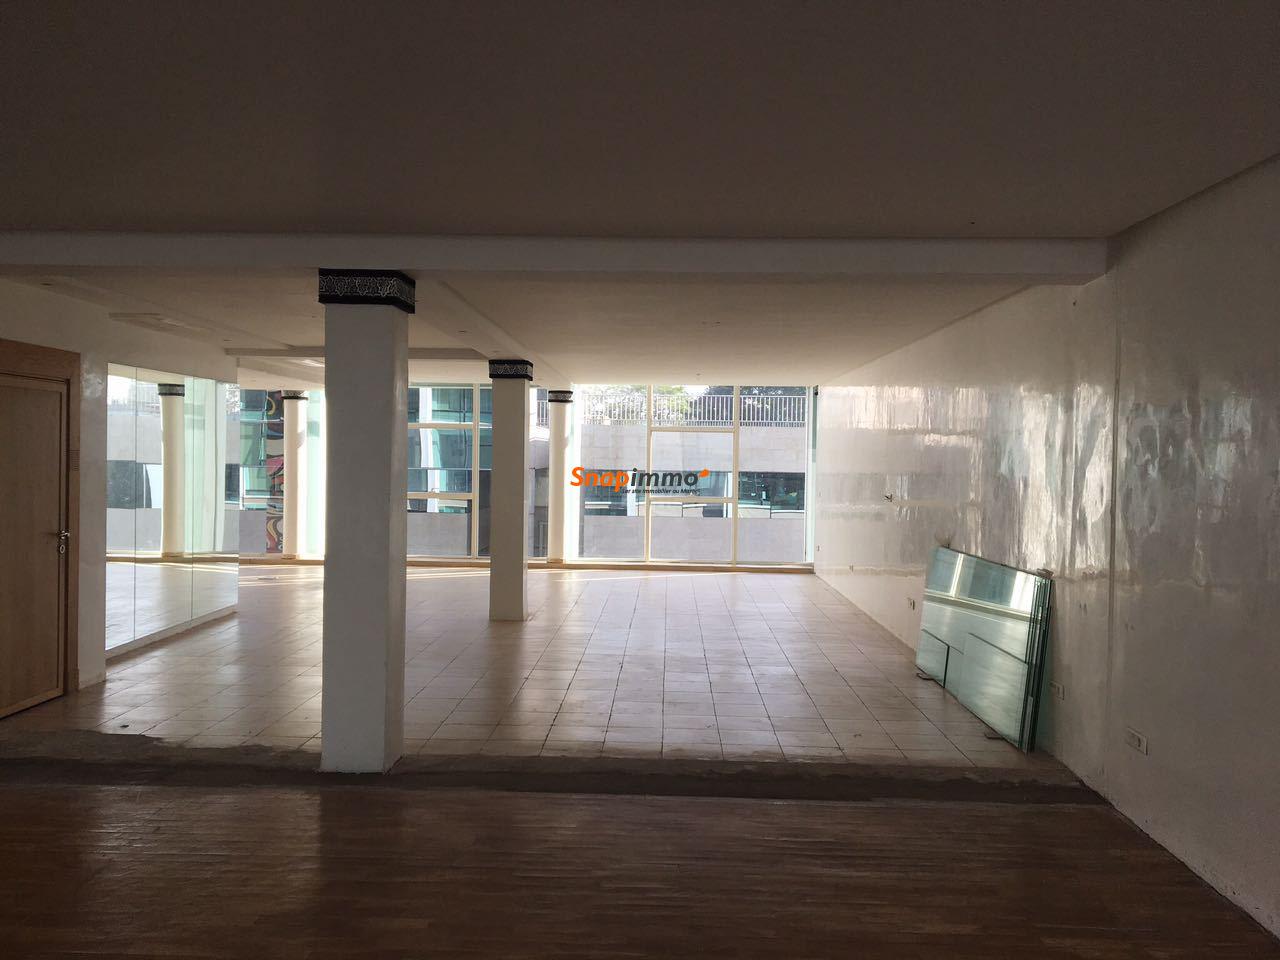 Plateau bureau/showroom Souissi - 4/4